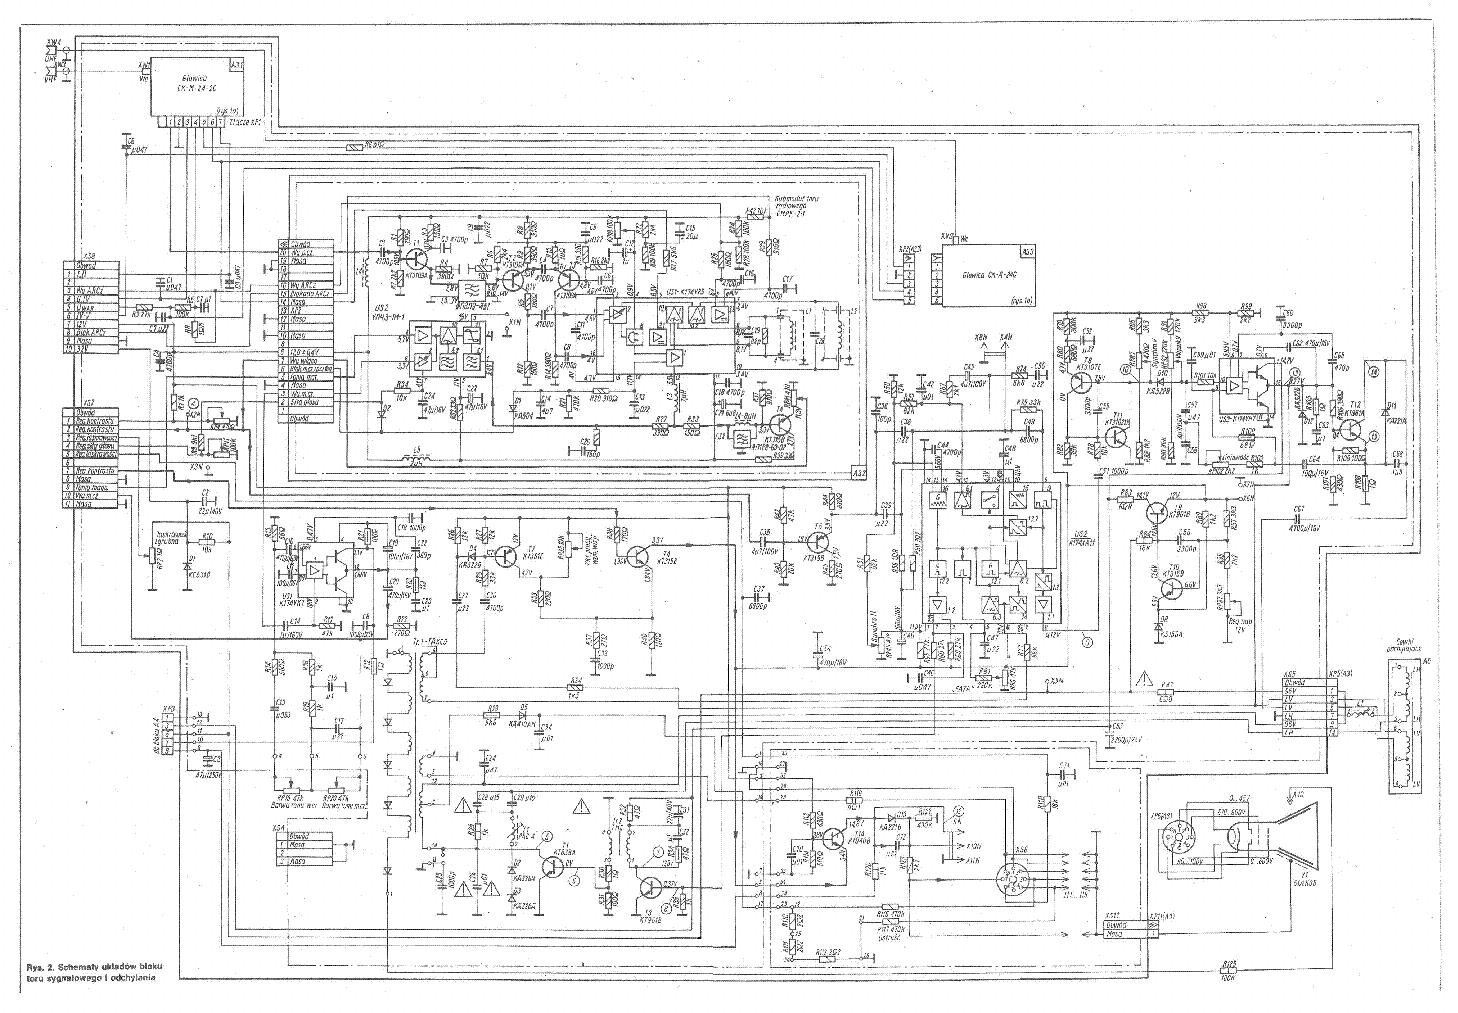 FOTON 234D Wiring Diagram